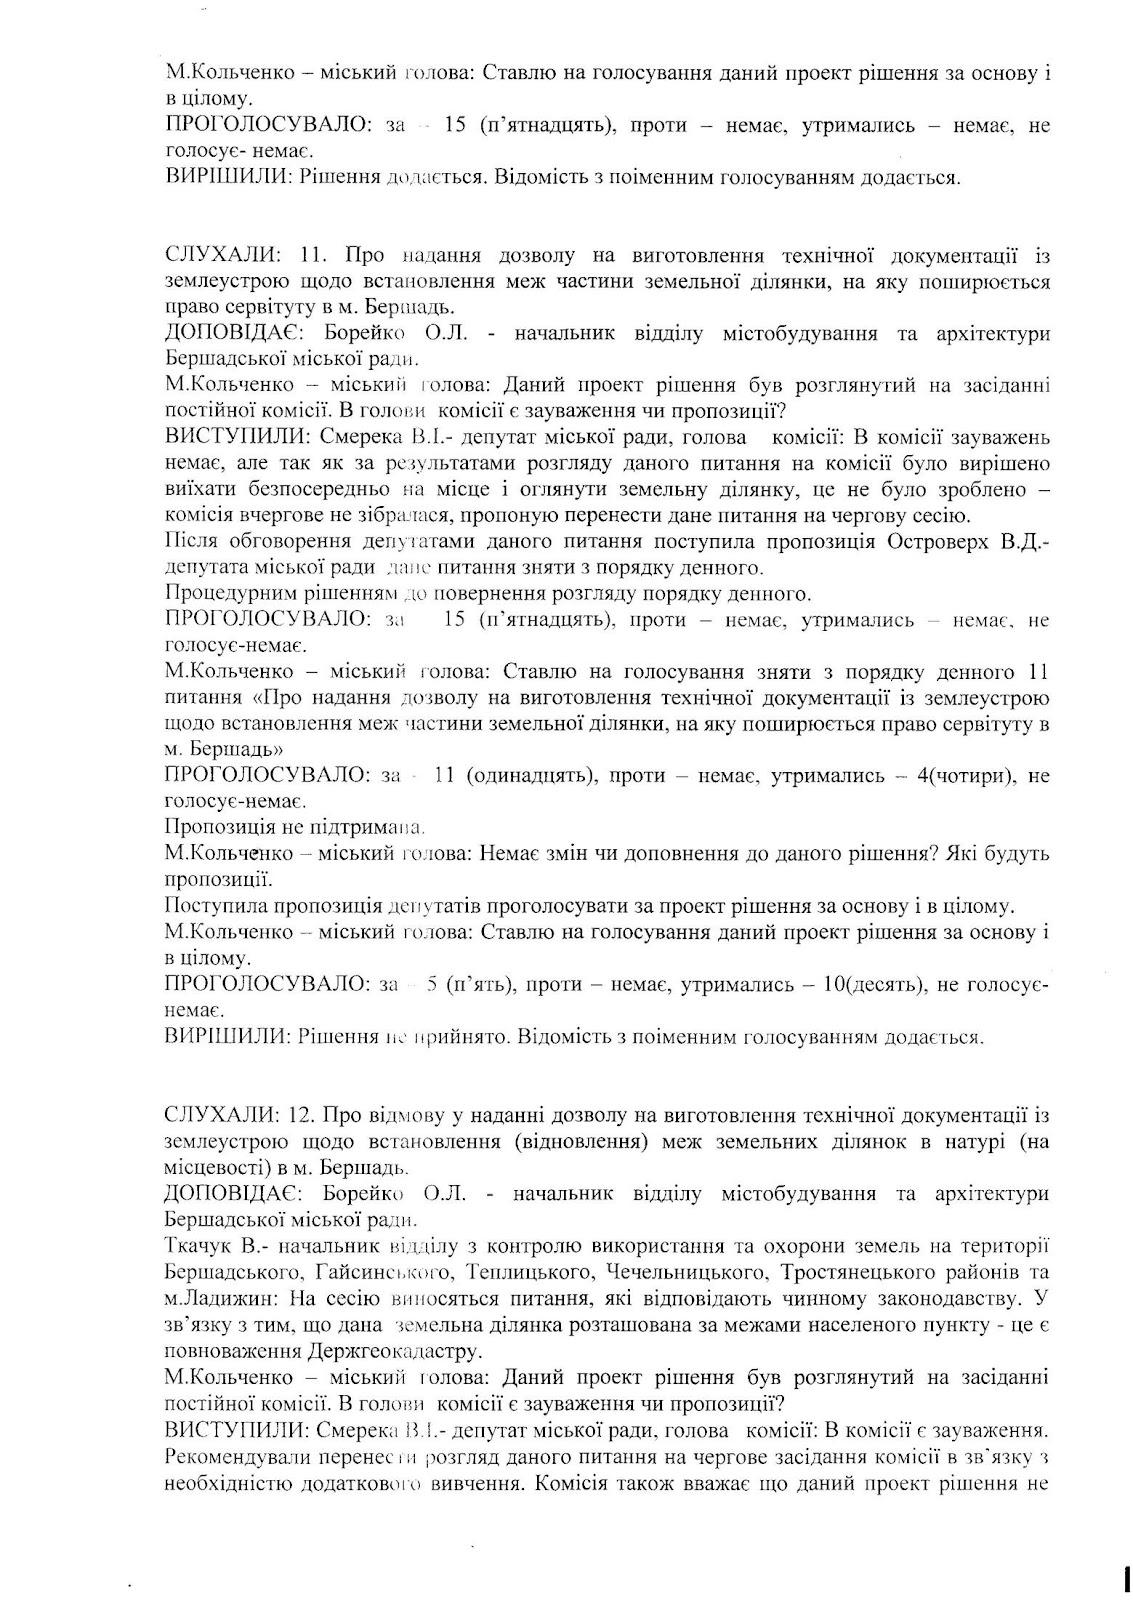 C:\Users\Администратор\Desktop\Сесії\СЕСІЇ 7 СКЛИКАННЯ\35 сесія 7 скликання\35 сесія 7 скликання\протокол №40\протокол №40 - 0007.jpg